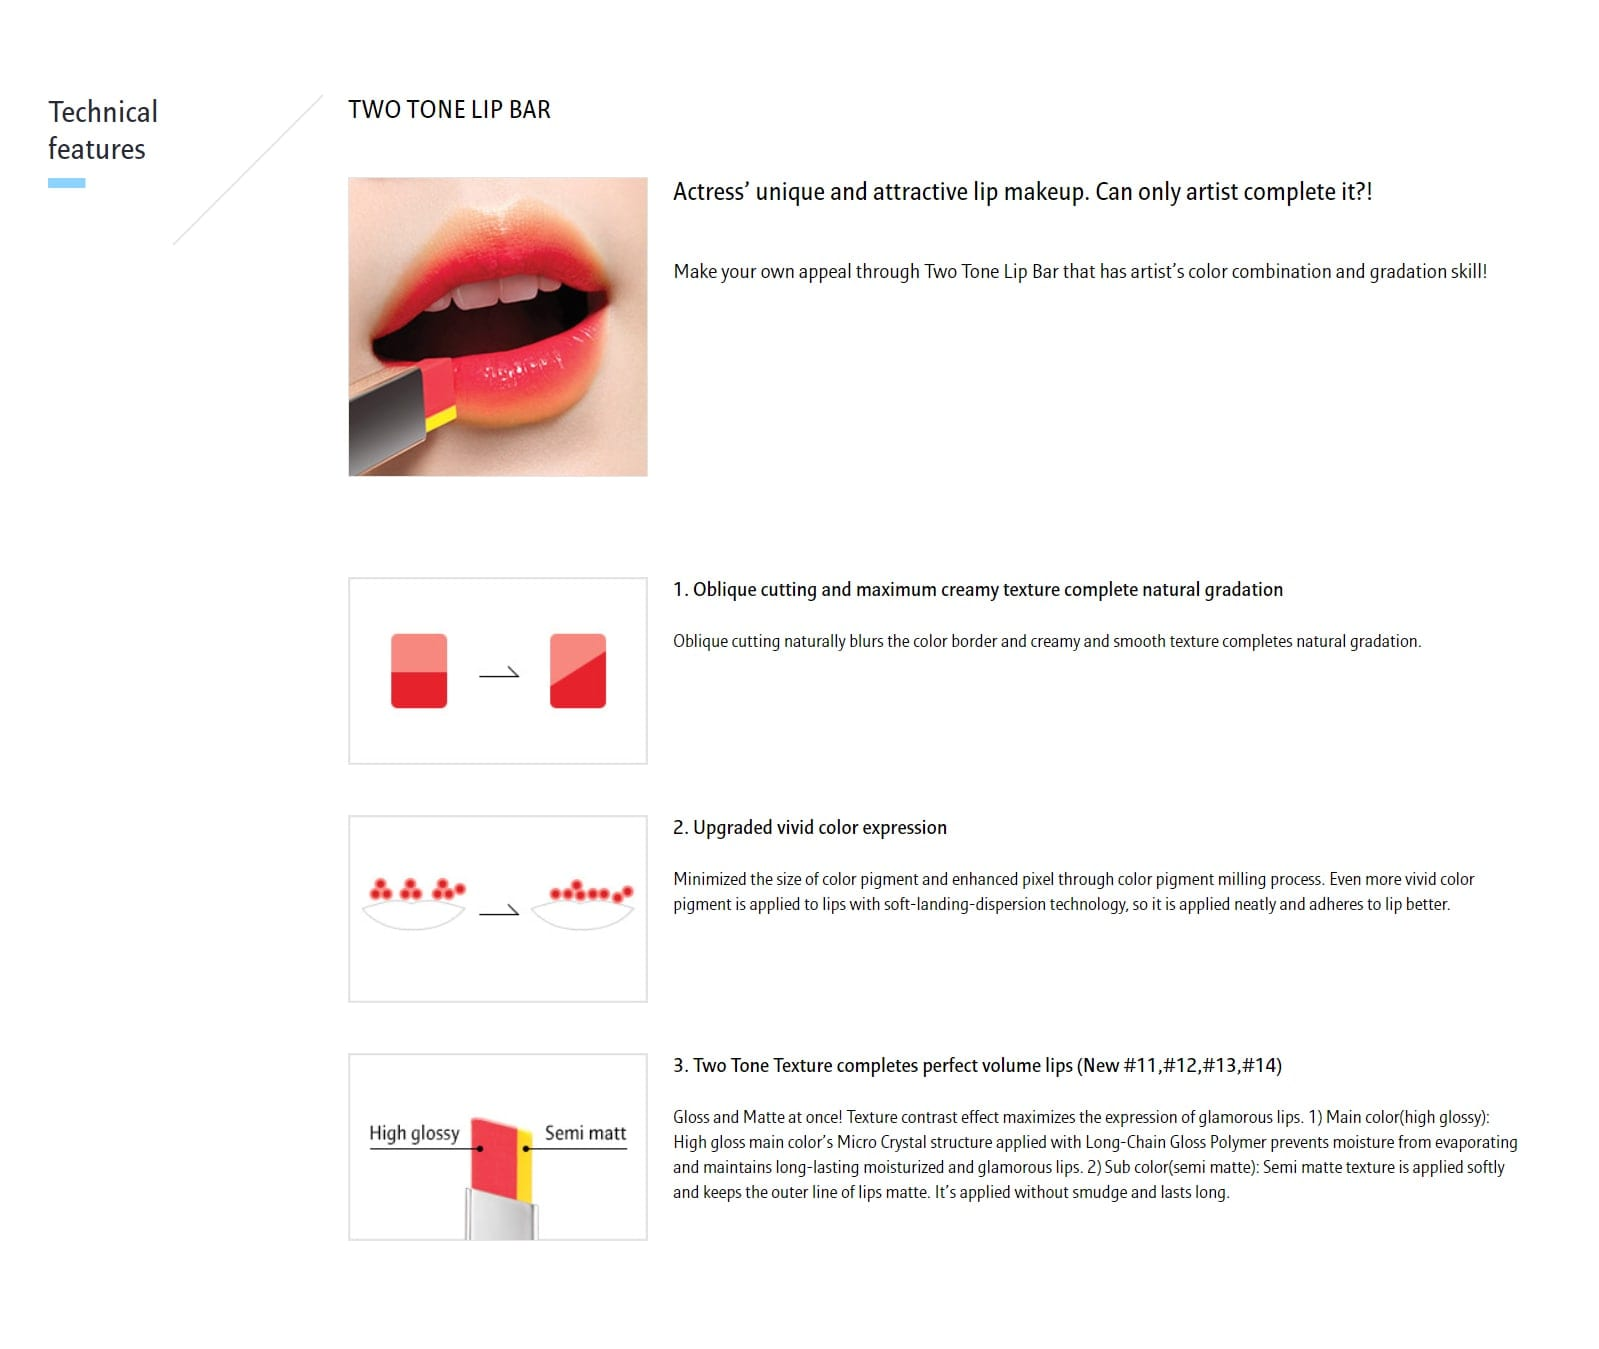 Laneige Two Tone Lip Bar - details